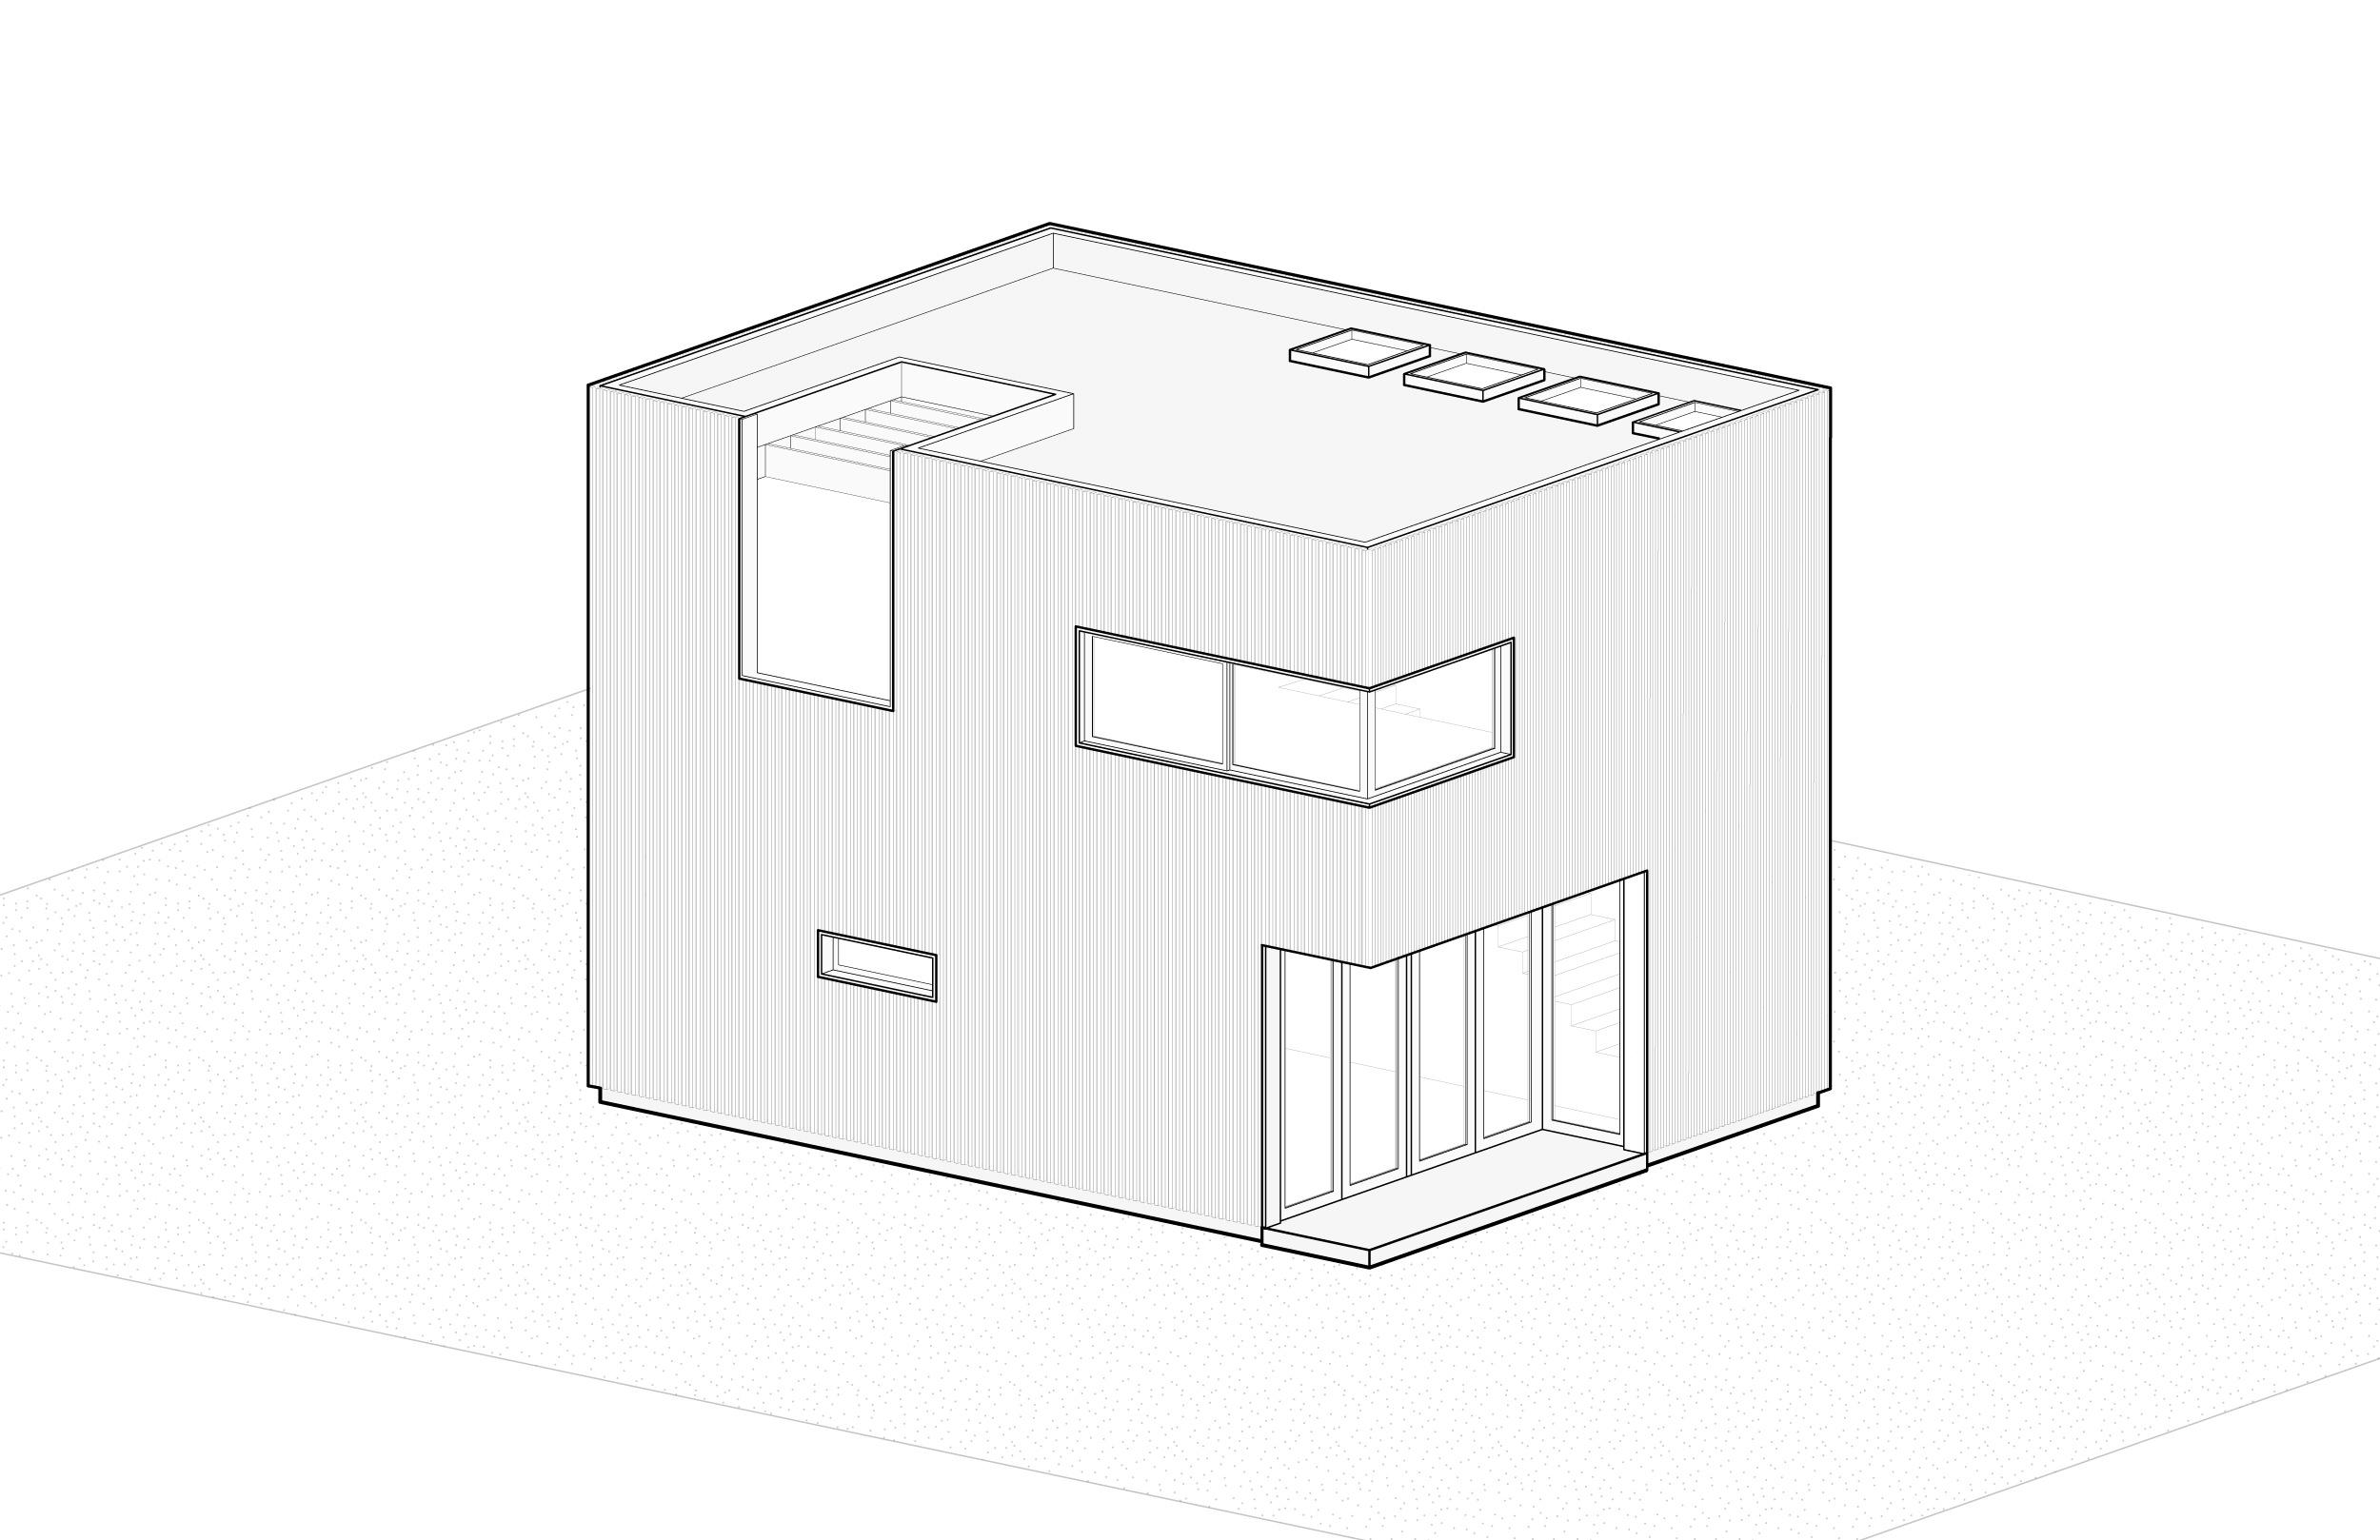 Studio-City-House_Diagram_07.jpg